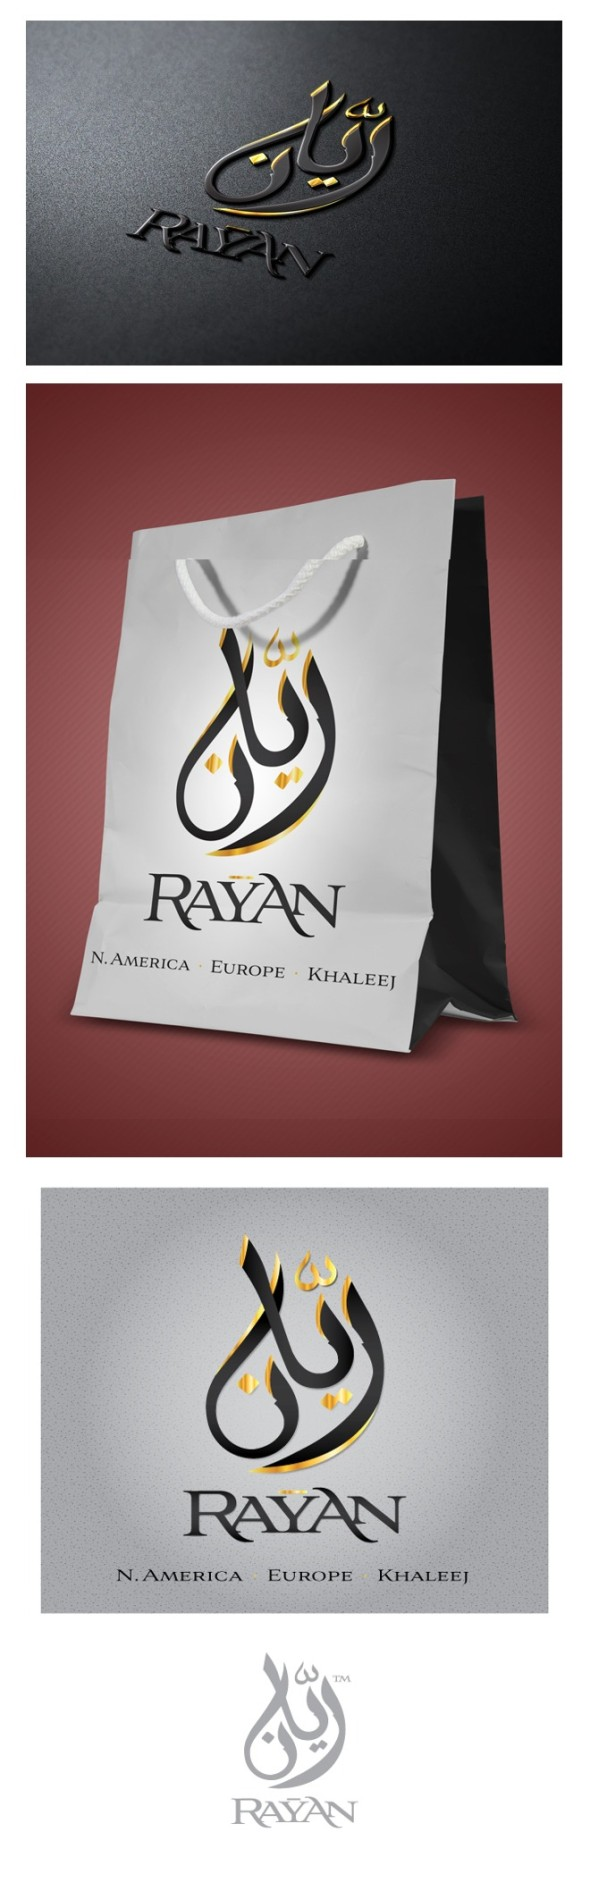 Rayan Arabic randing